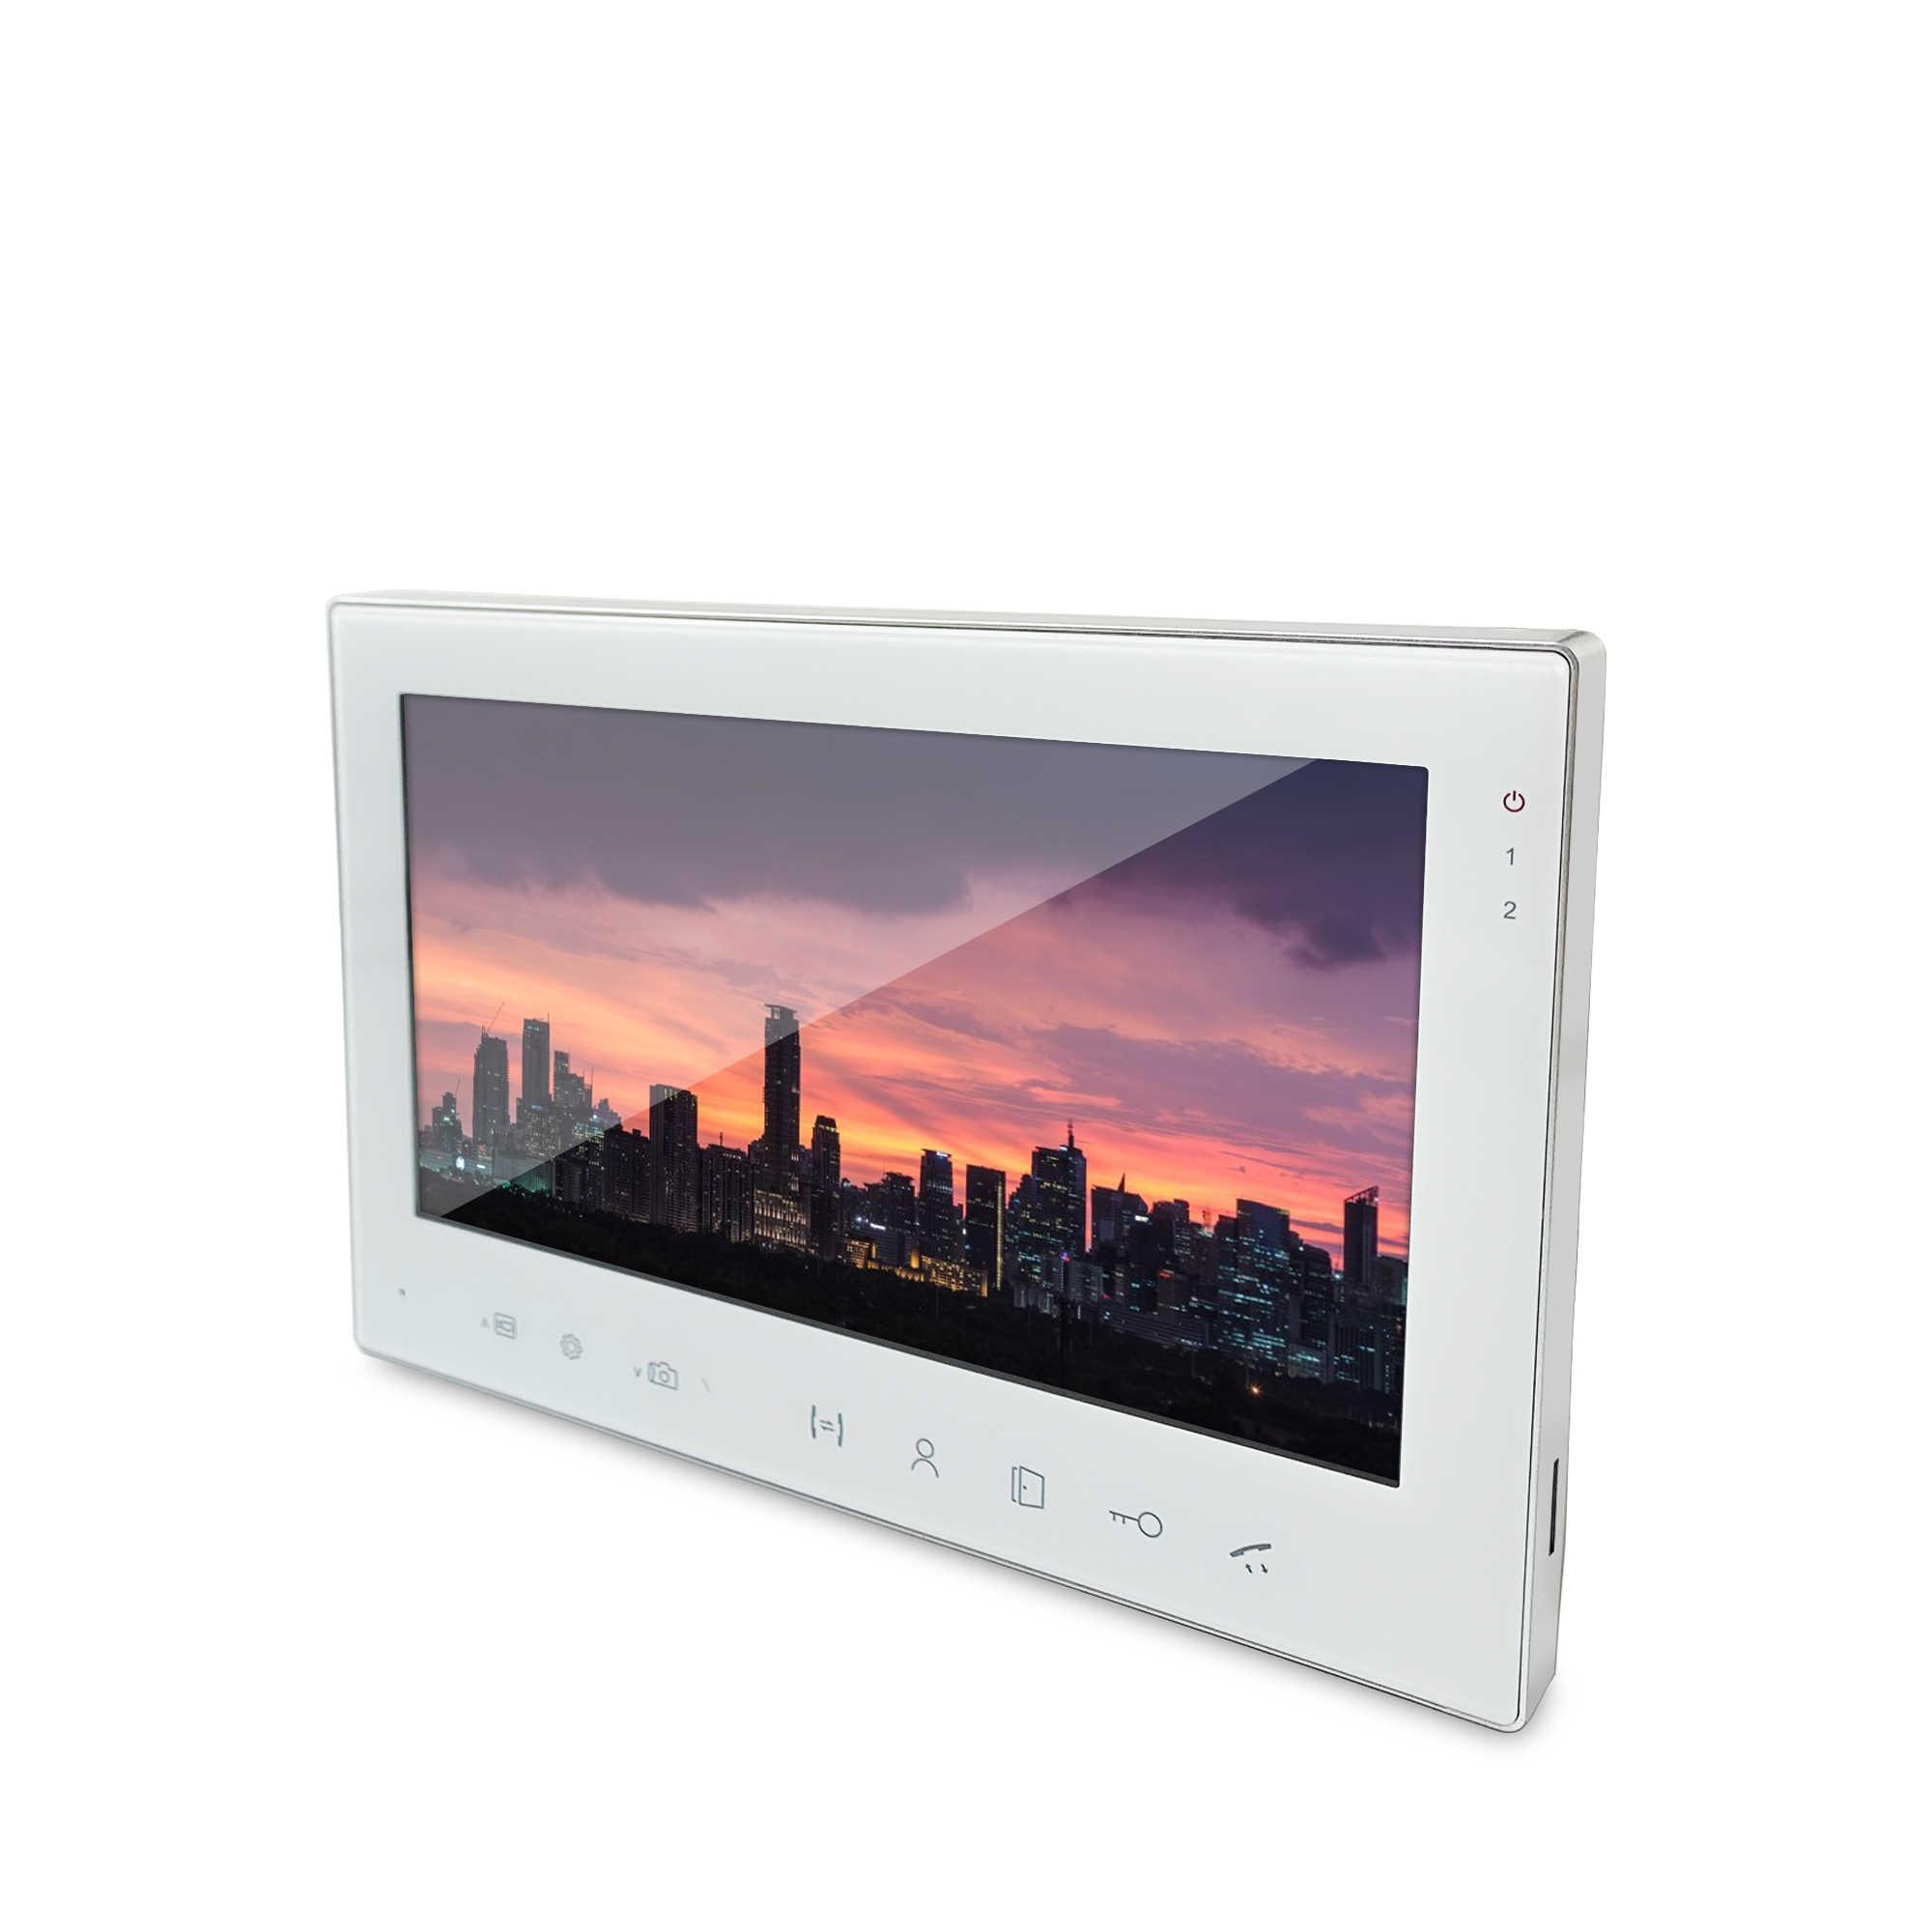 Dragonsview 7 بوصة تعمل باللمس زر فيديو باب الهاتف الجرس كاميرا نظام اتصال داخلي السلكية 1000tvl سجل بطاقة SD إنذار الحركة